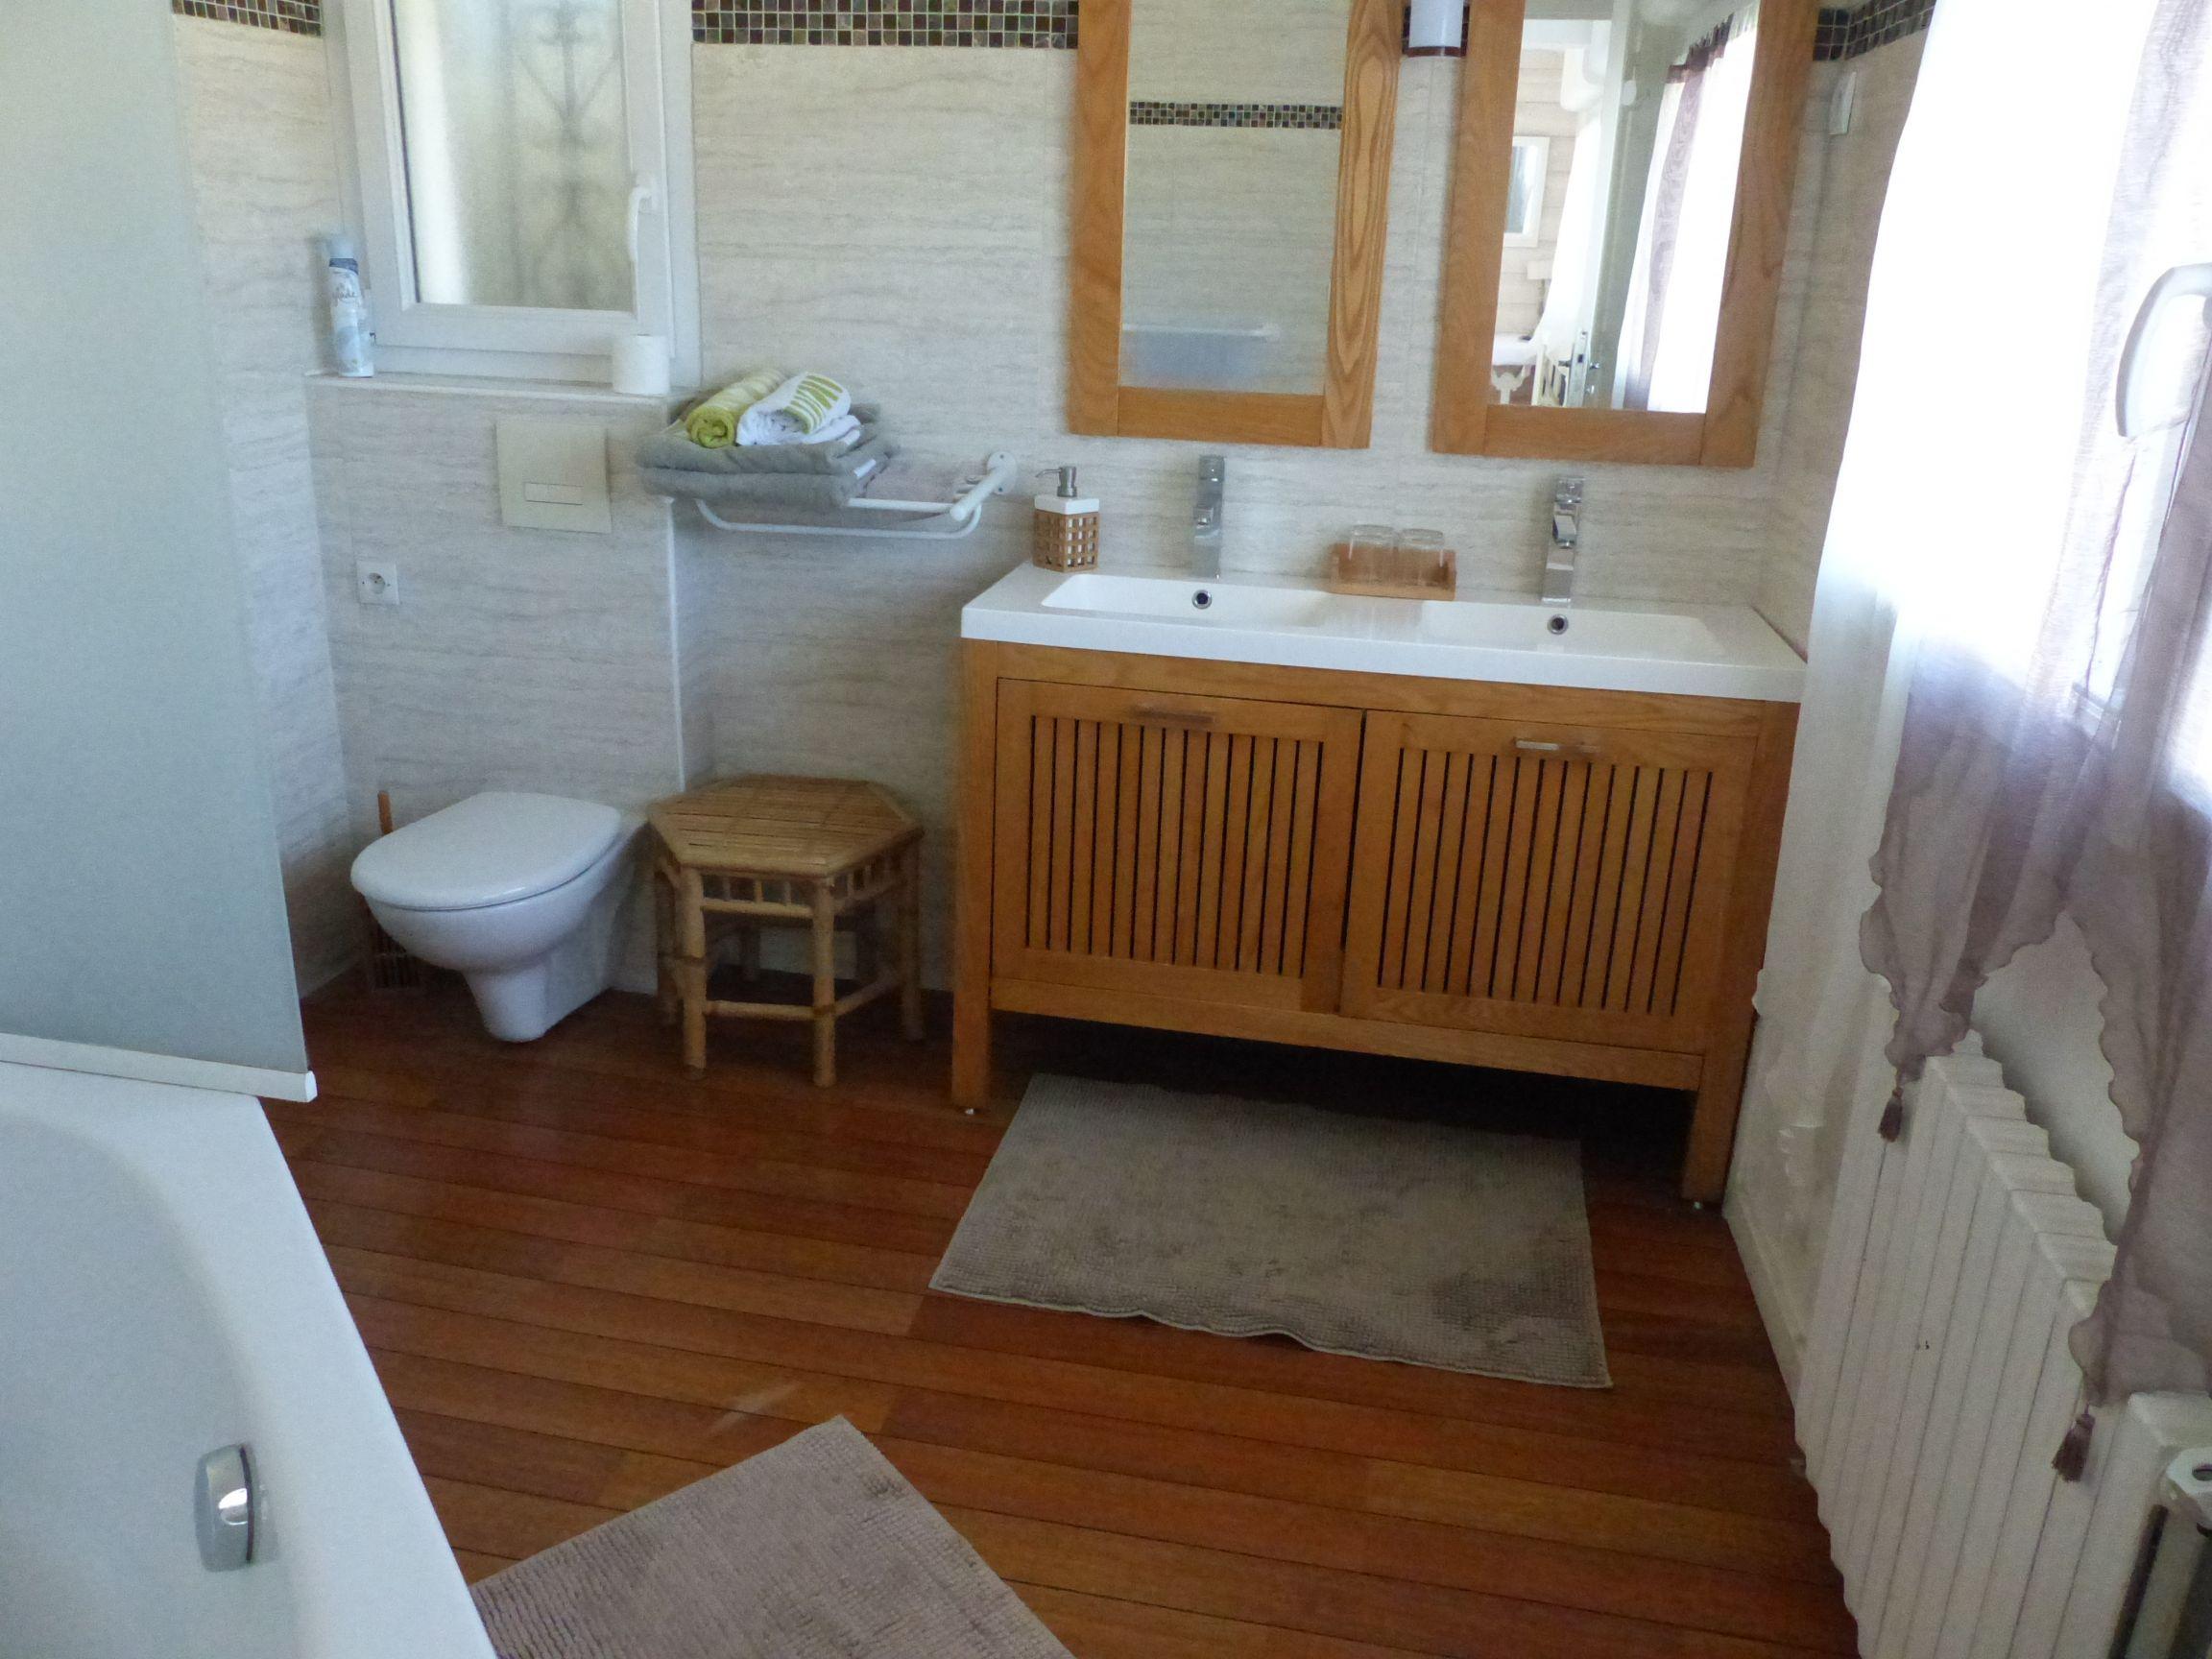 La suite Pyla possède une grande salle de bain